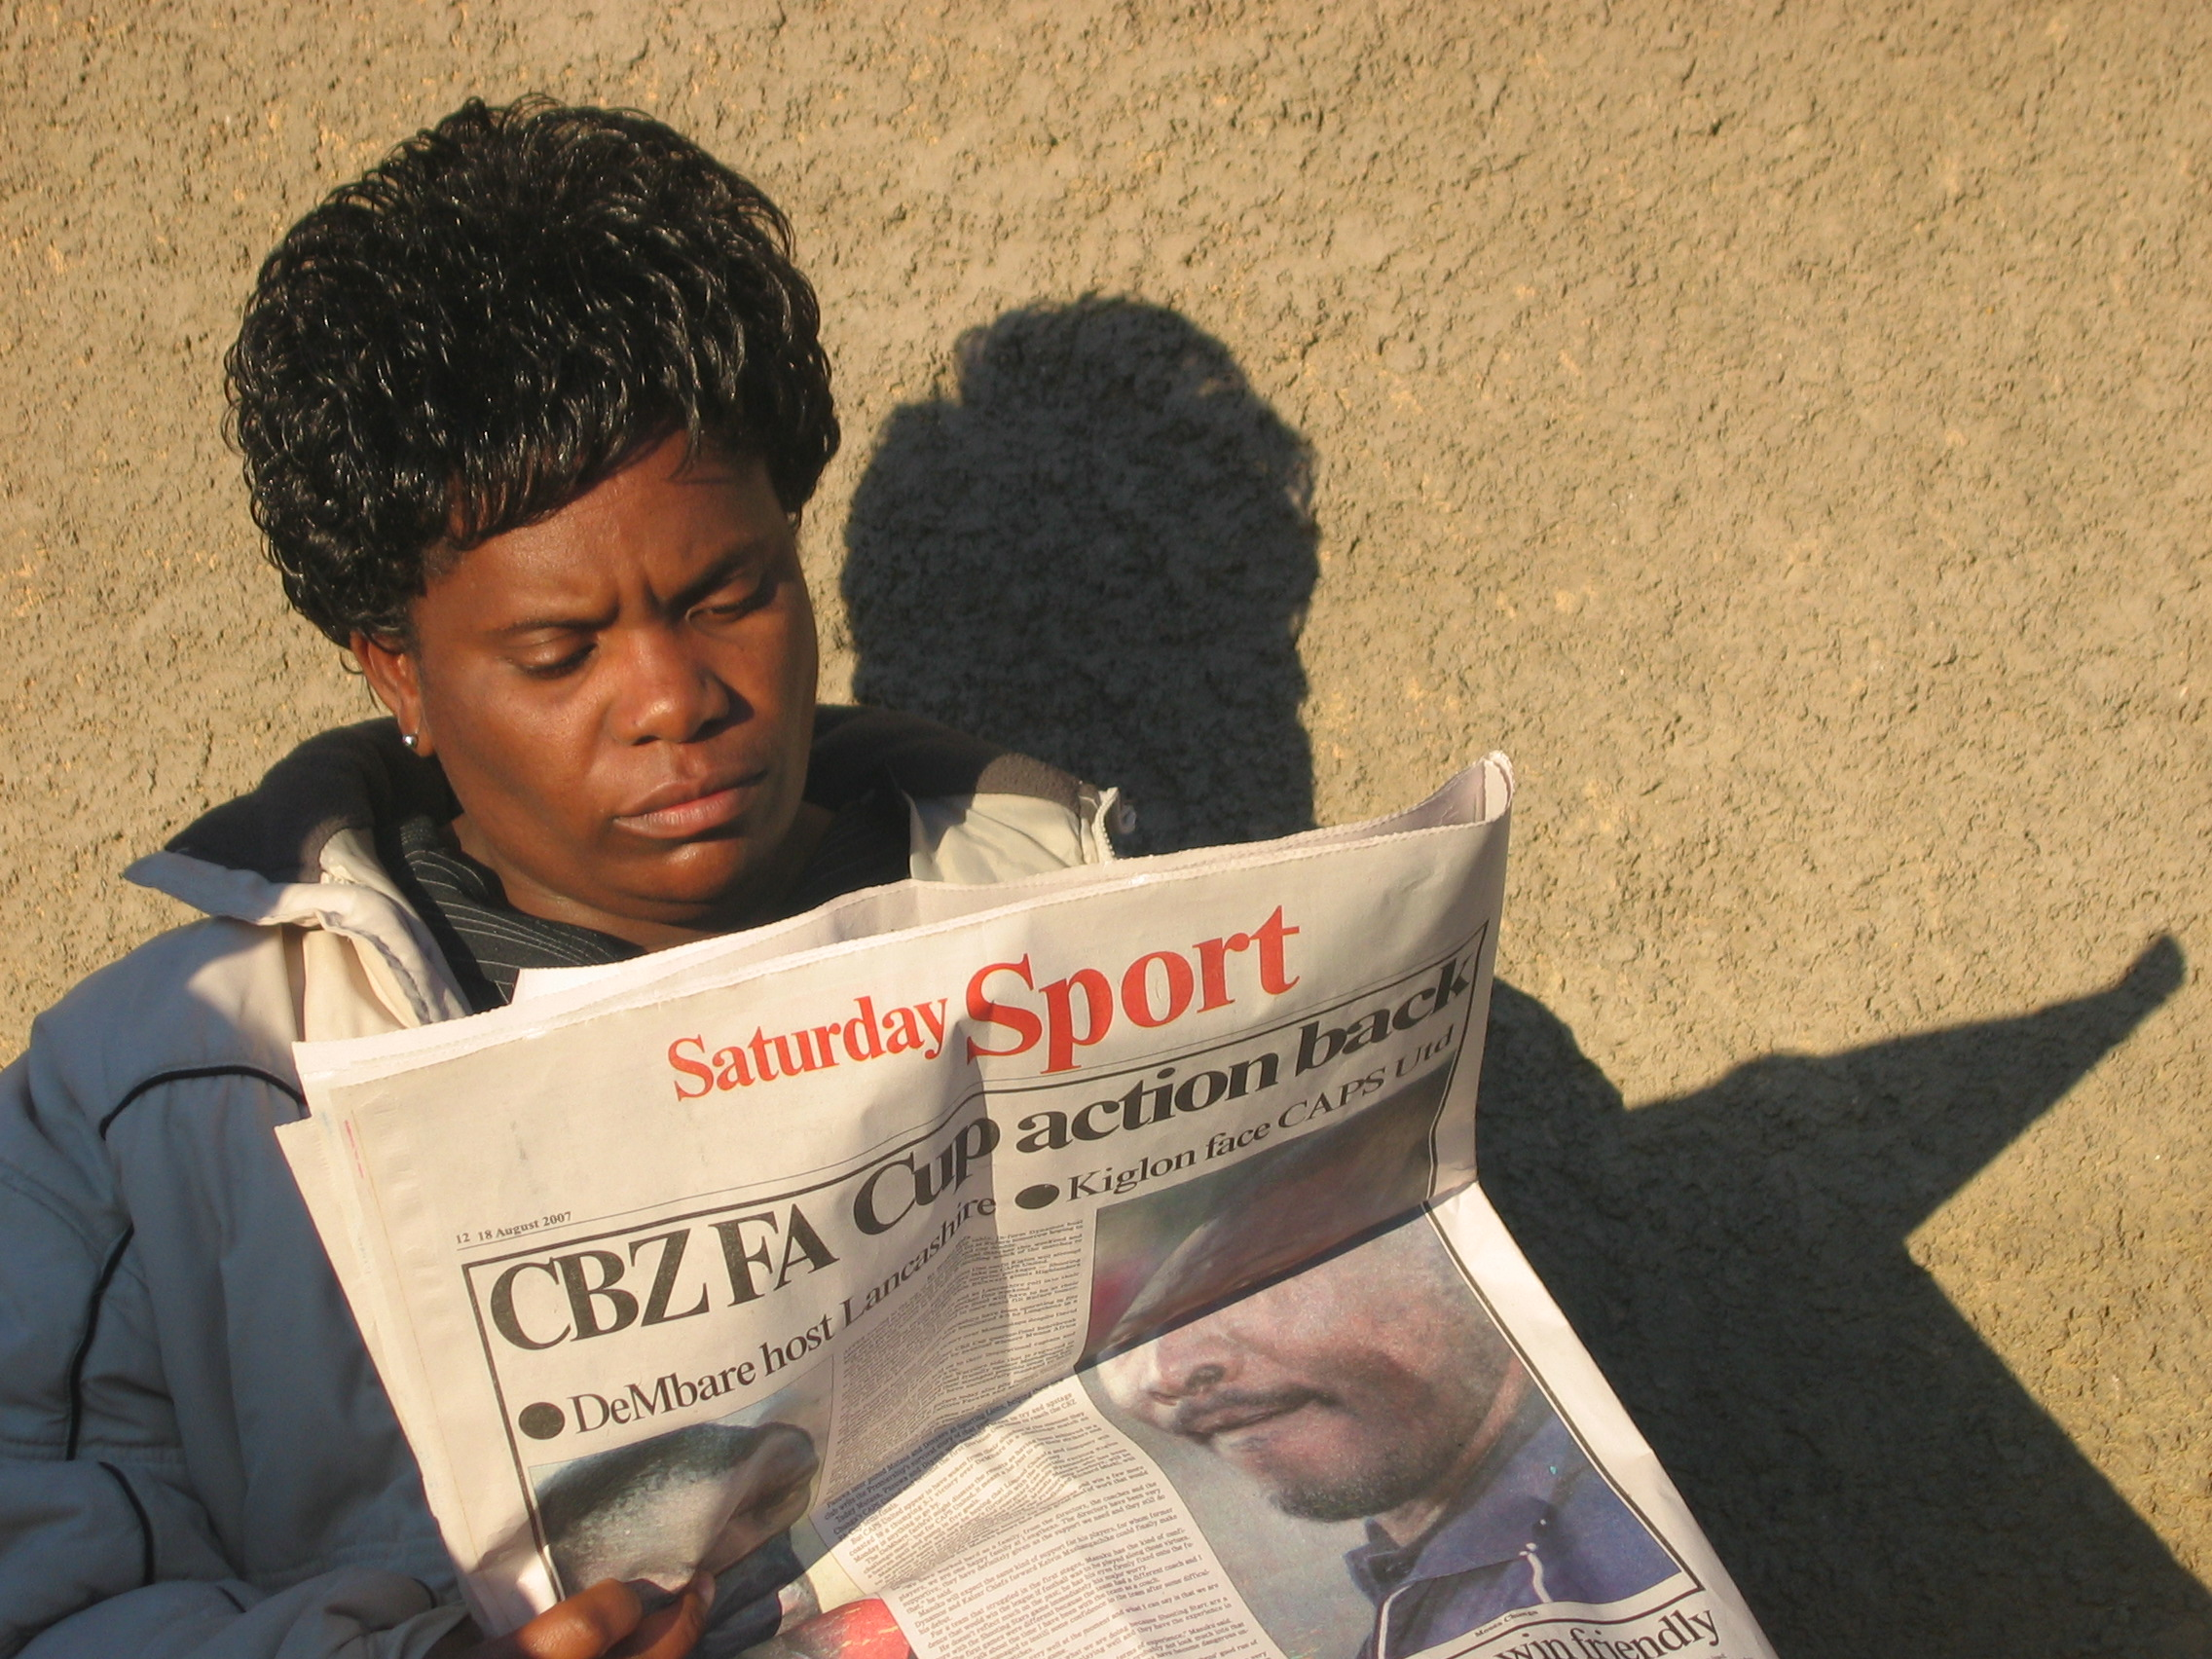 Zimbabwe2007 011.jpeg